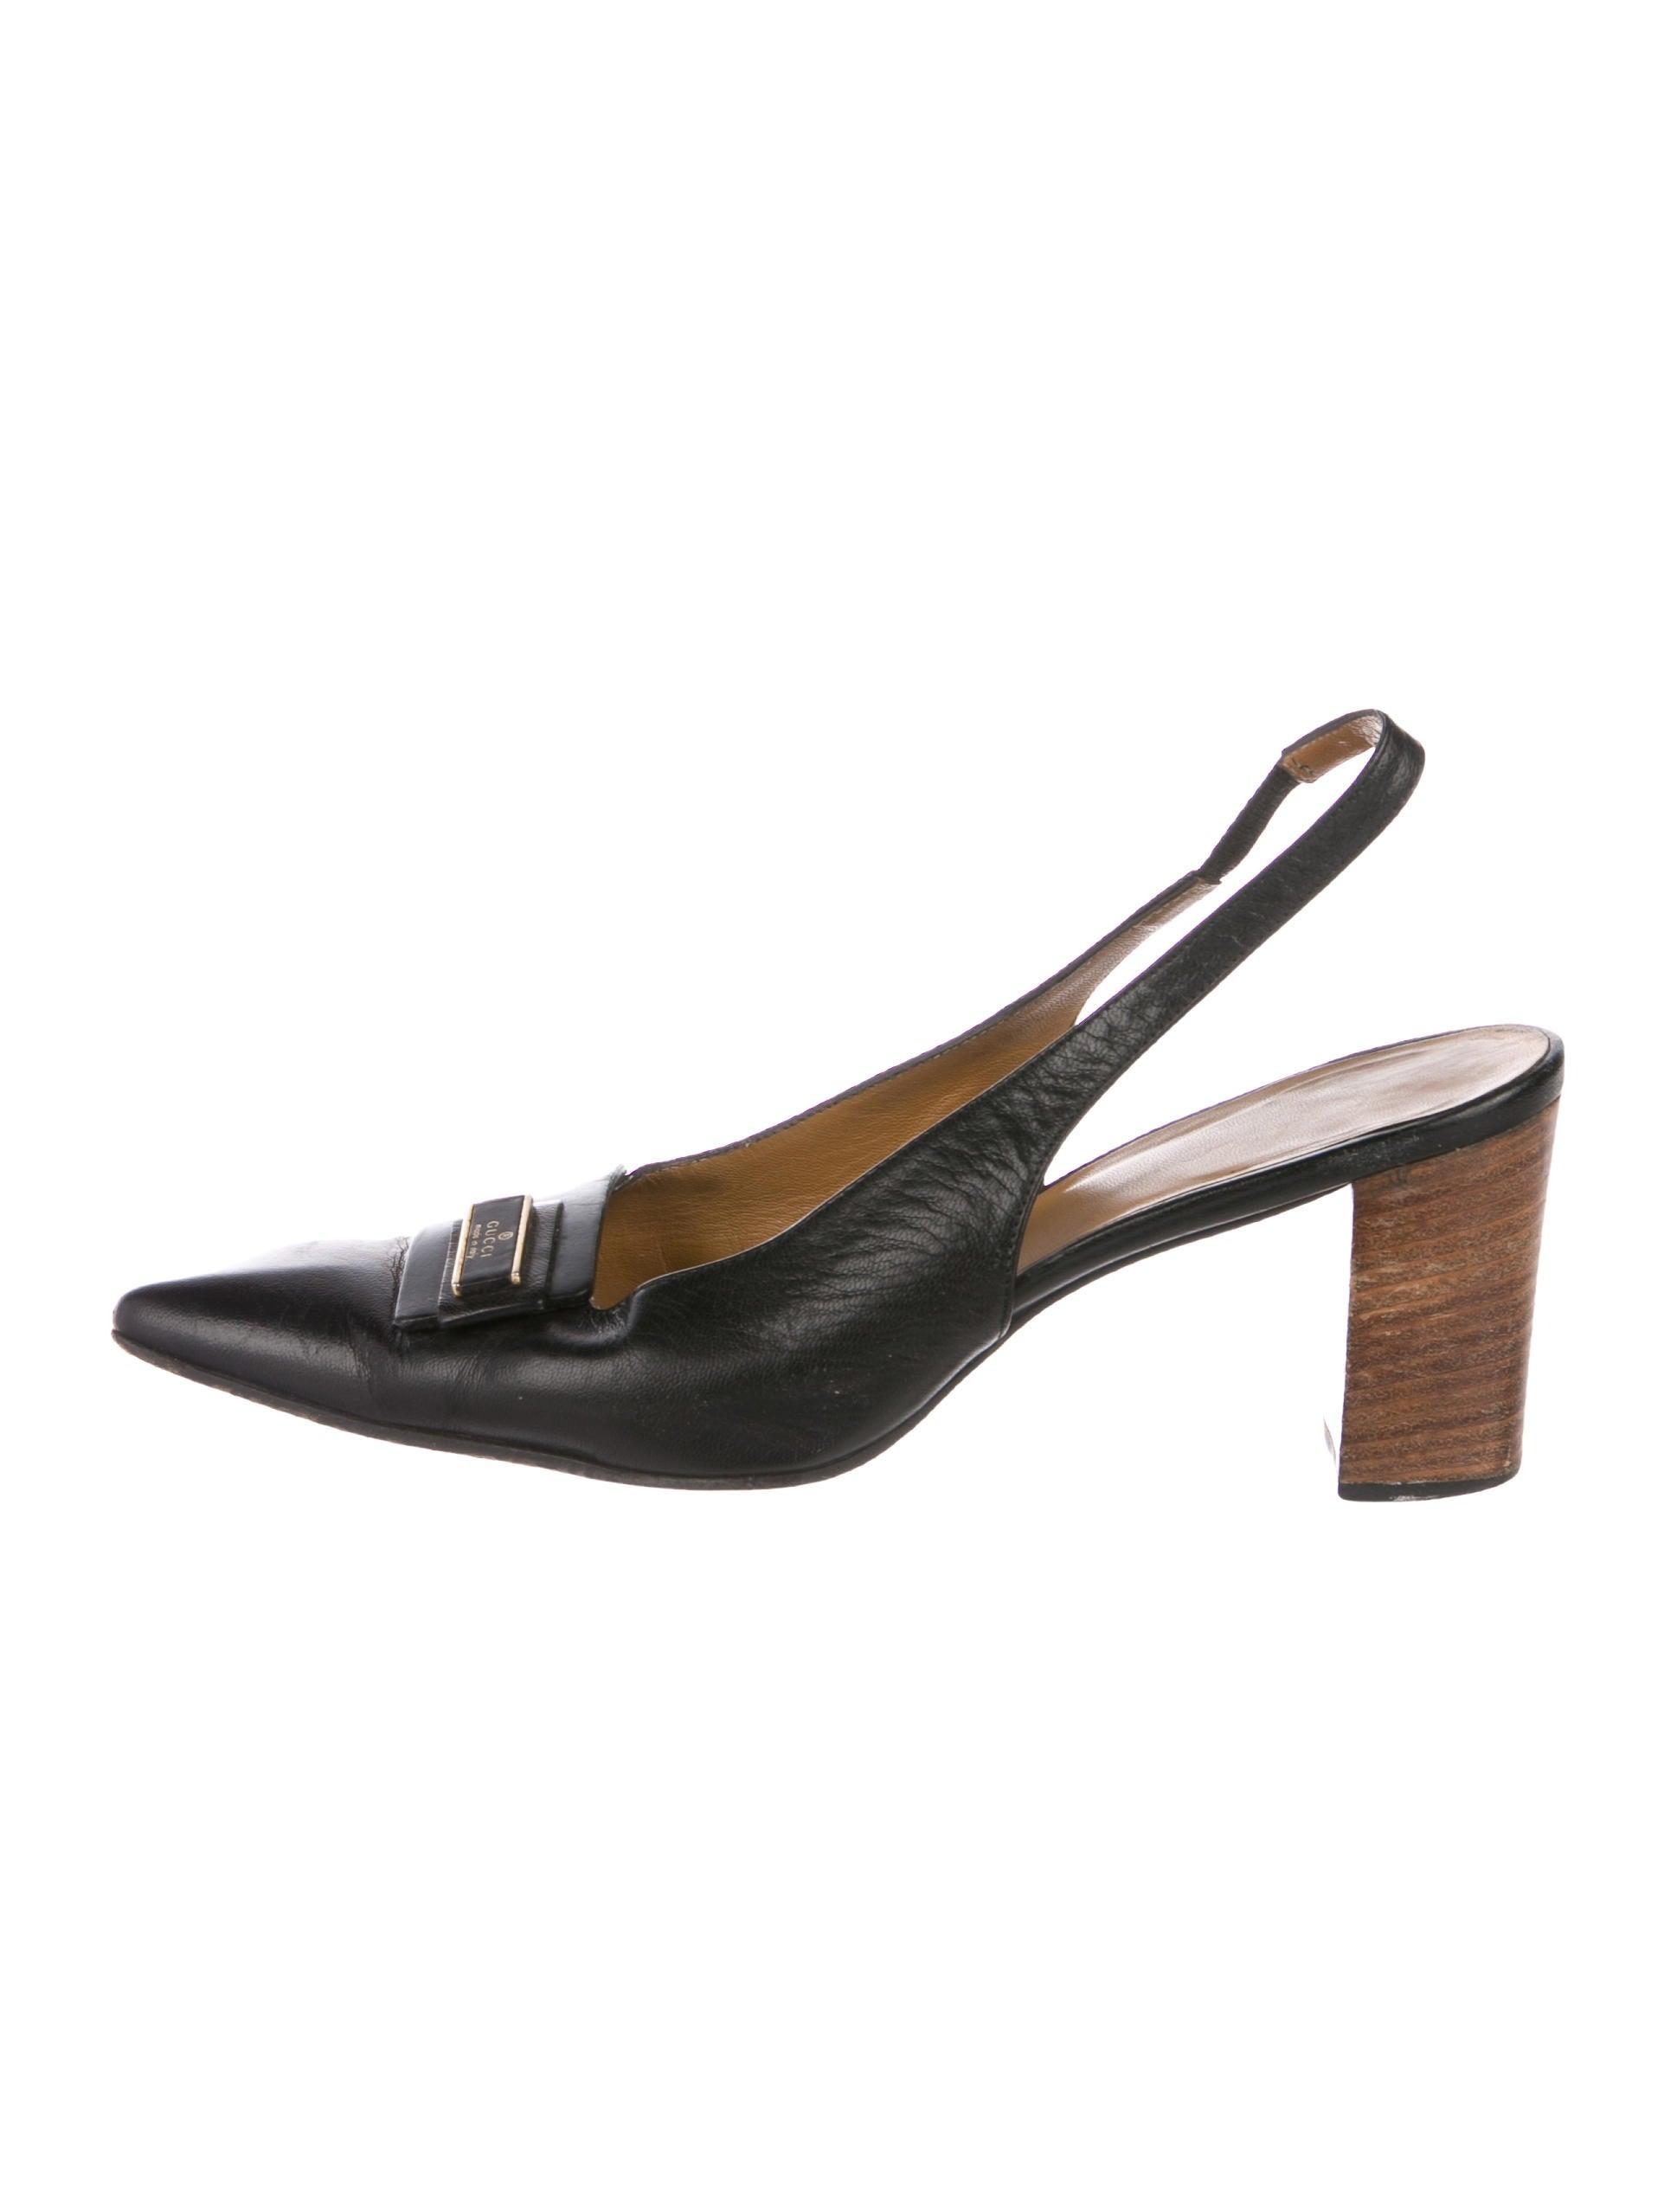 Gucci Vintage Leather Slingbacks - Shoes - GUC263295